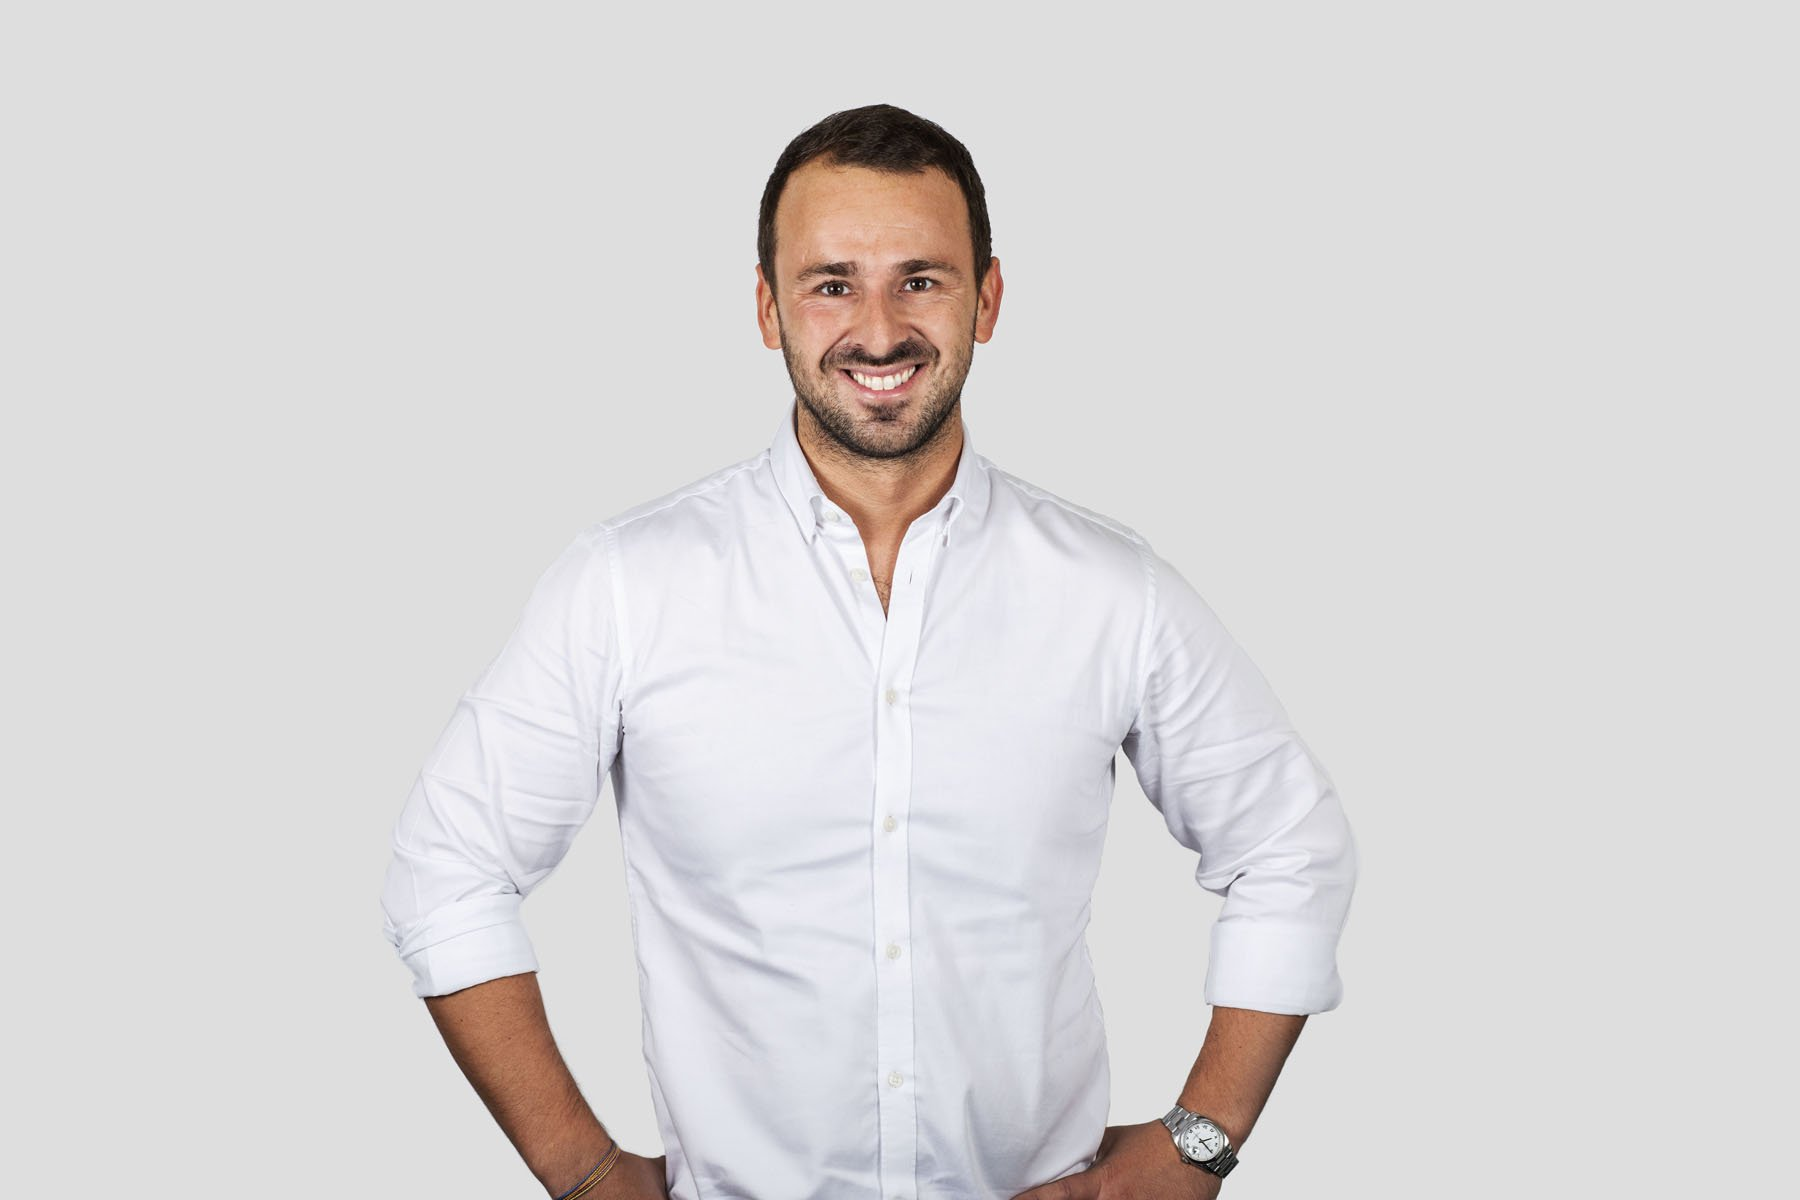 Lukas Dudek